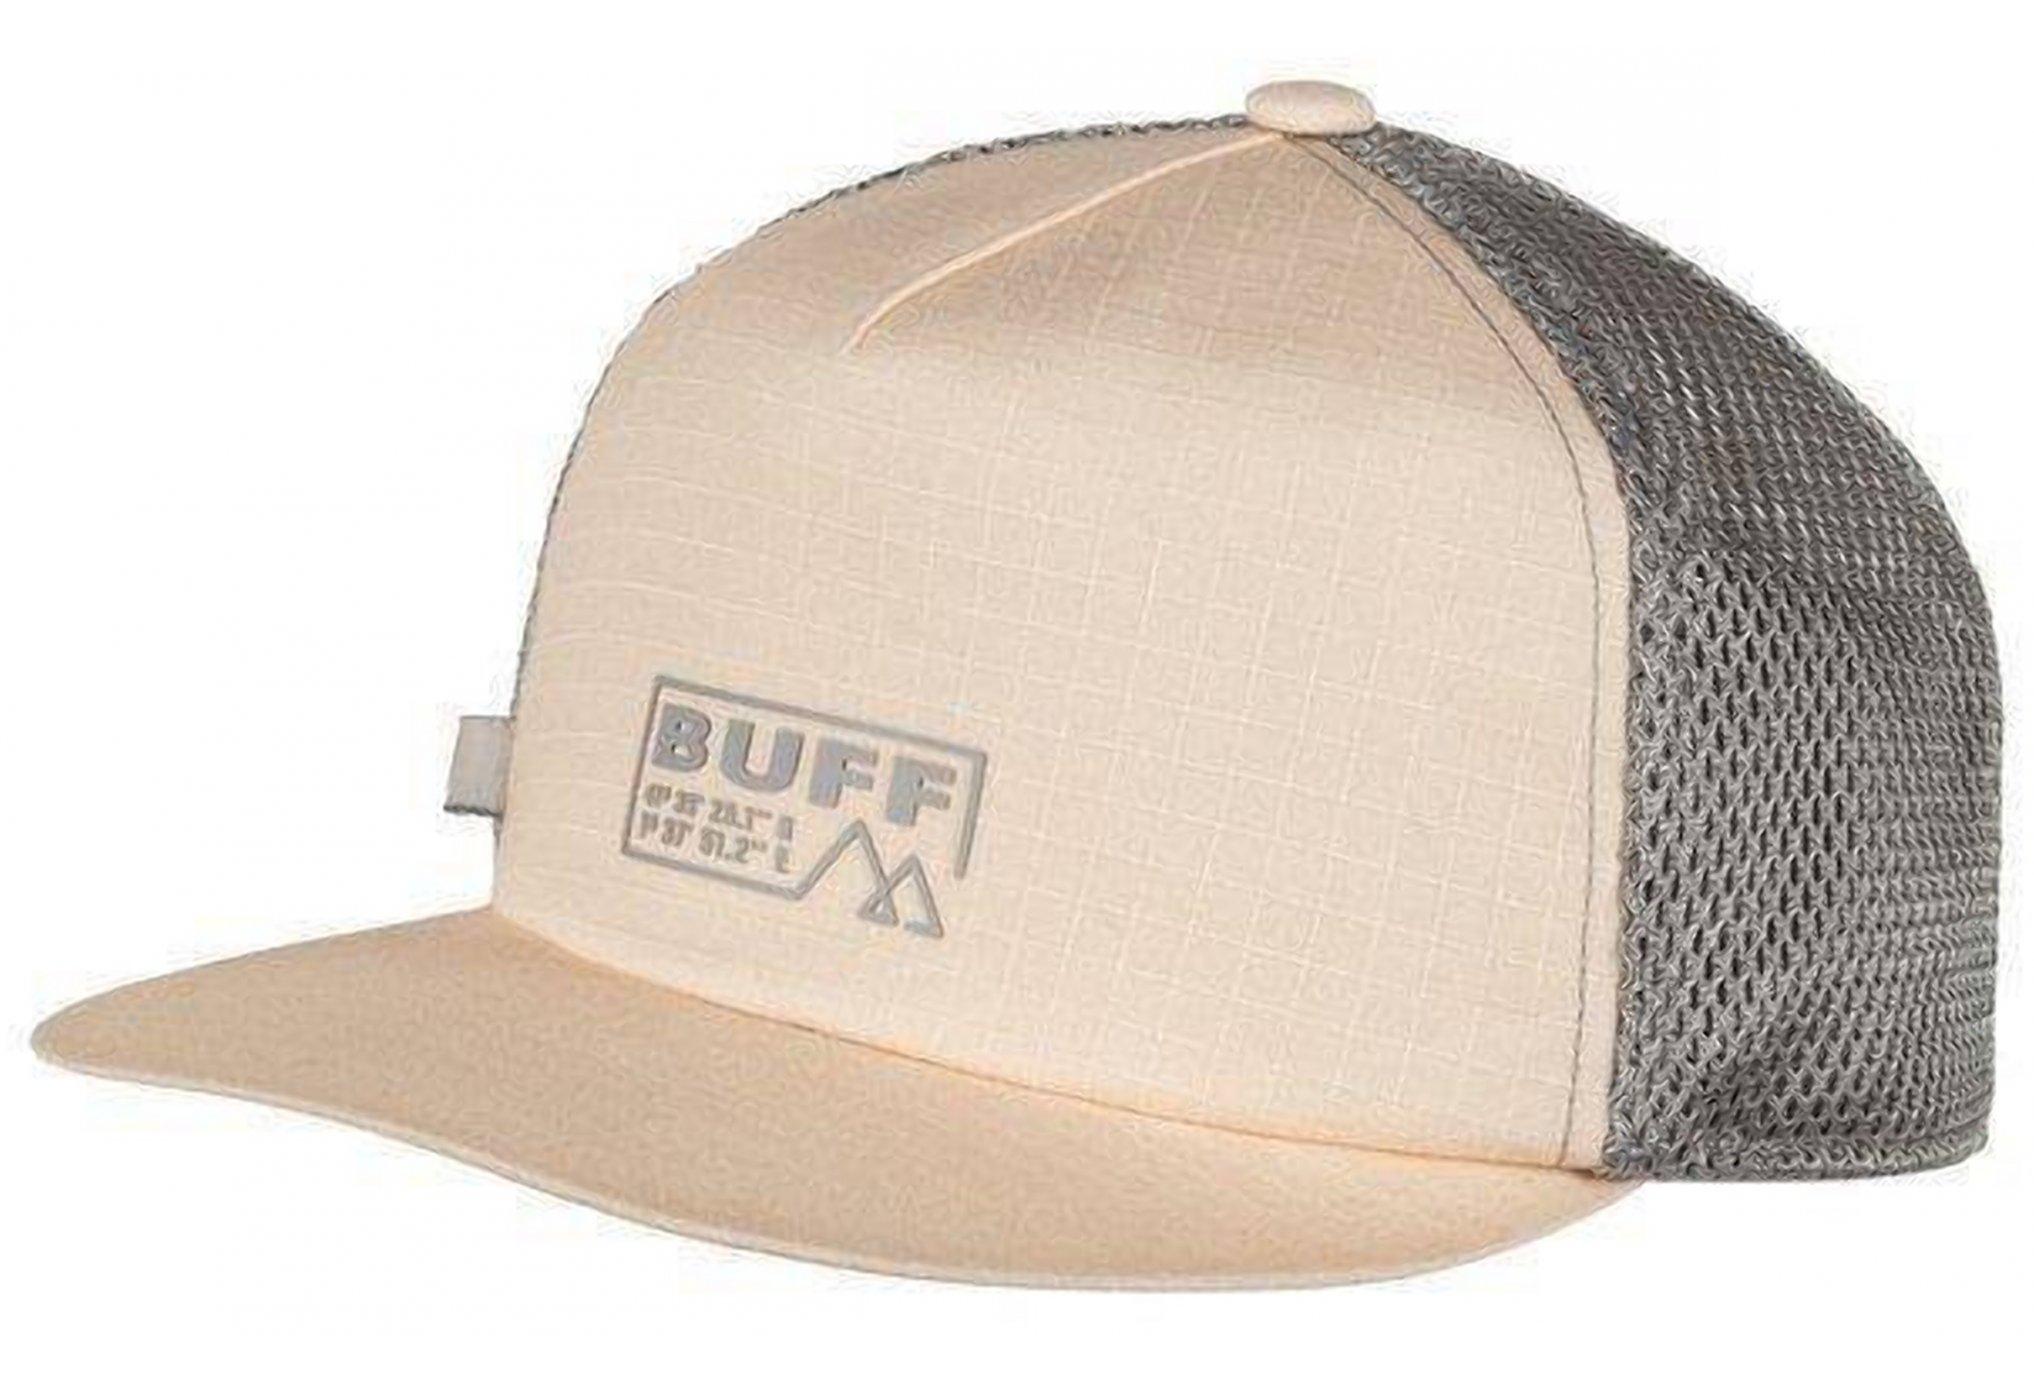 Buff Pack Trucker Cap Solid Sand Casquettes / bandeaux